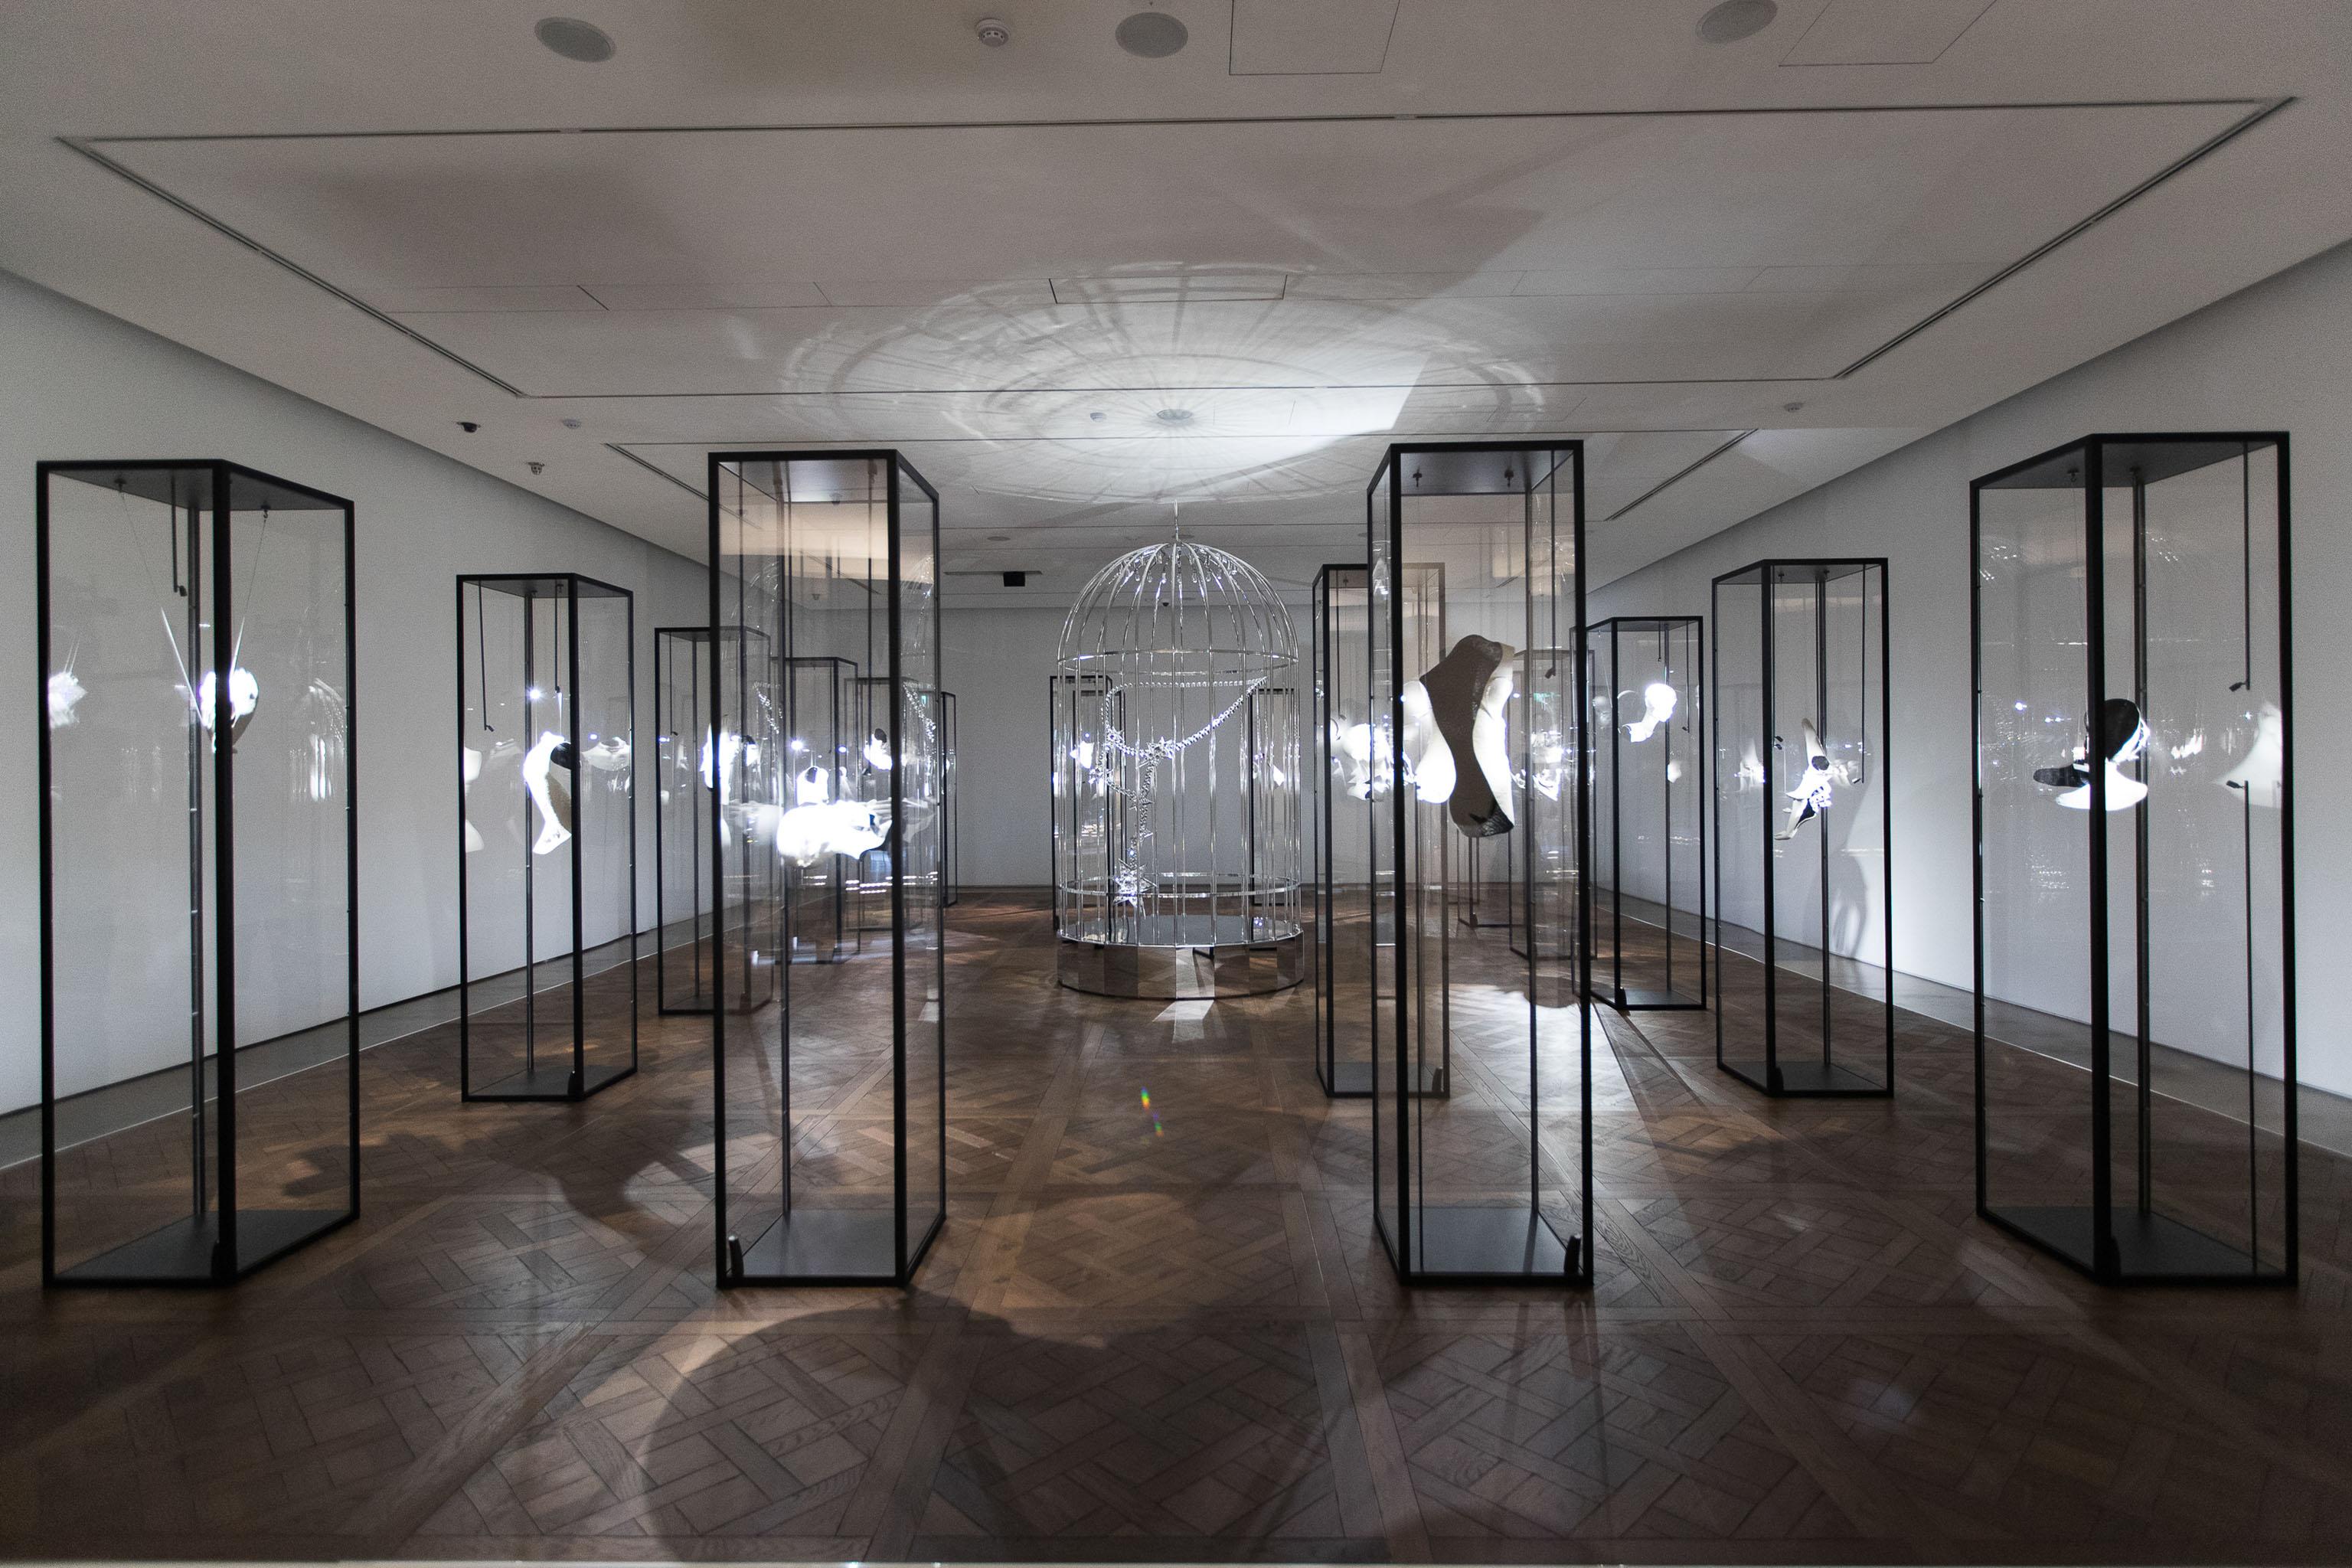 D Exhibition Hong Kong : Chanel quot mademoiselle privé exhibition in hong kong senatus